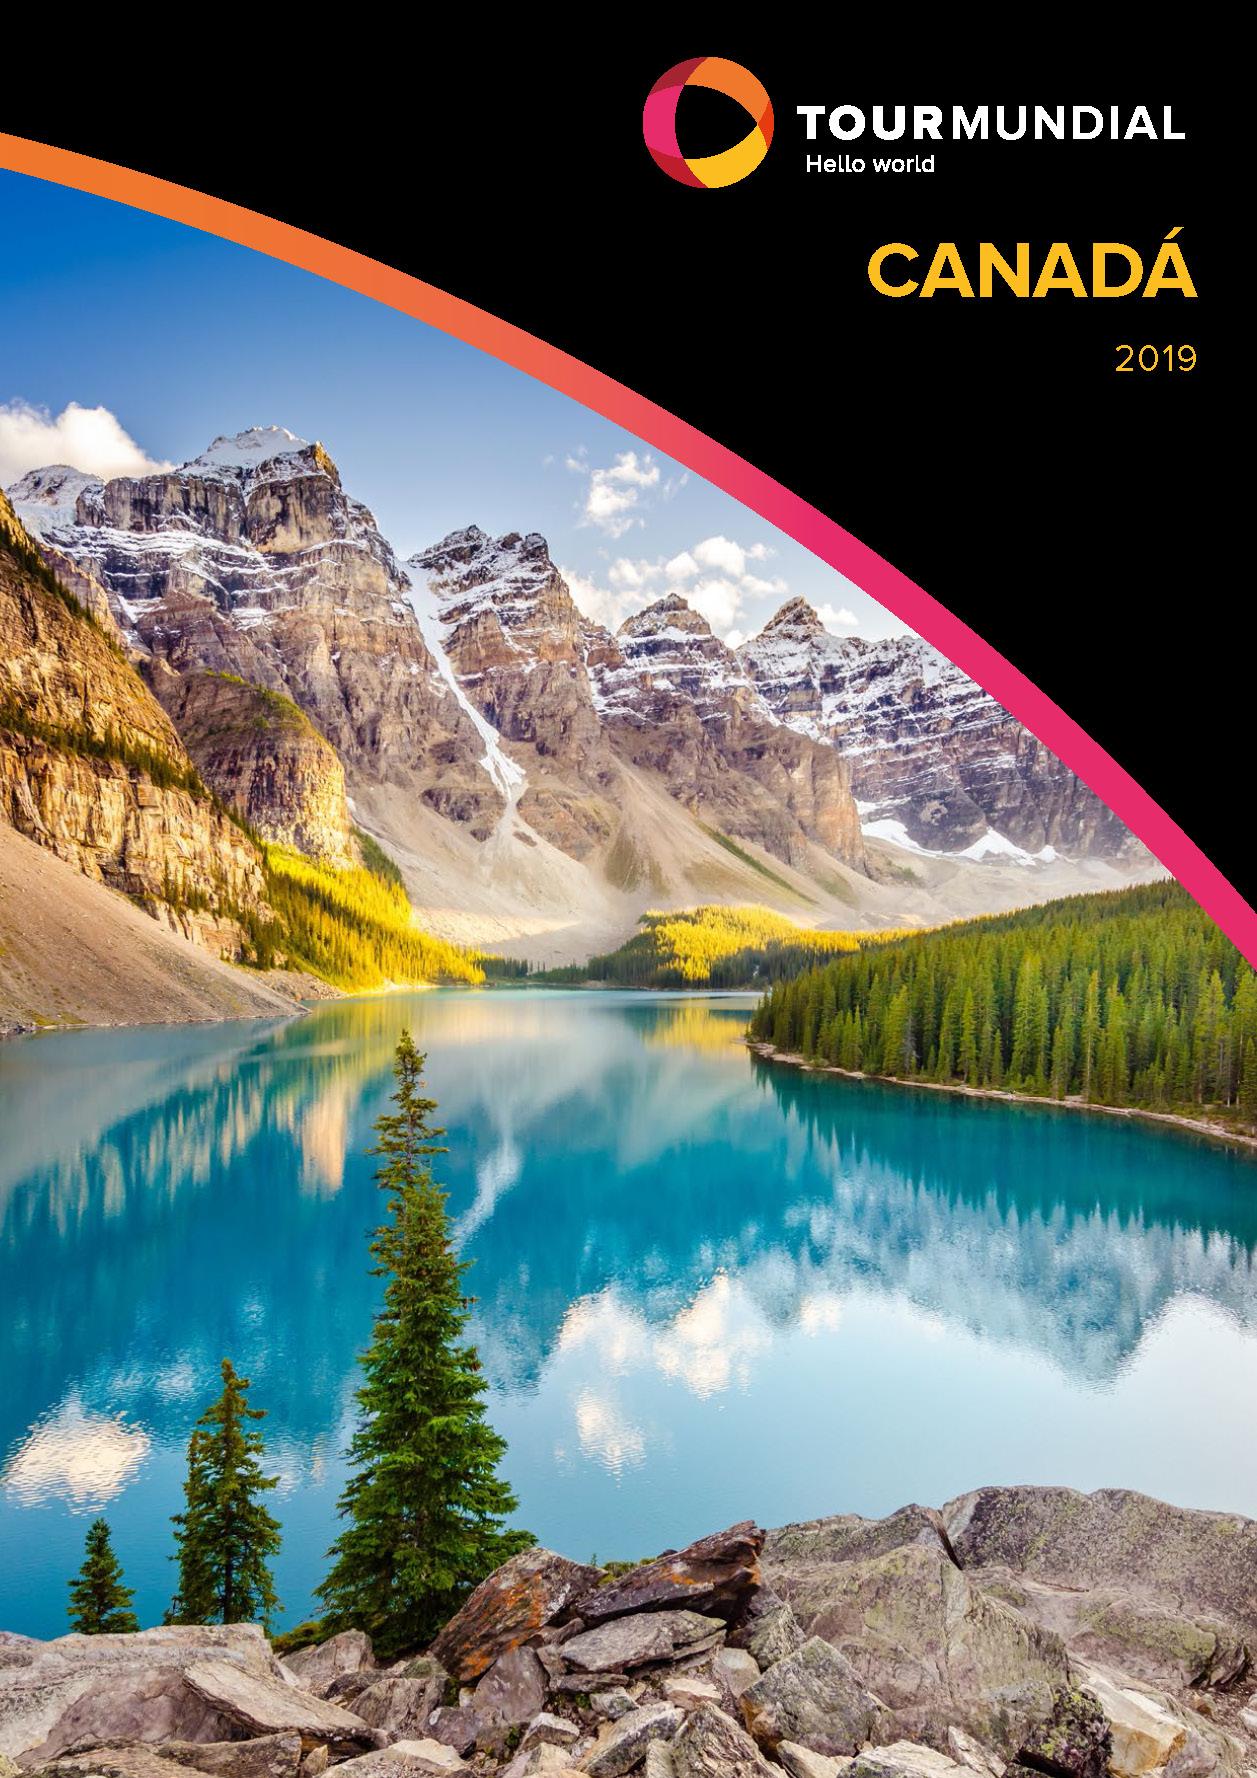 Catalogo Tourmundial Canada 2019